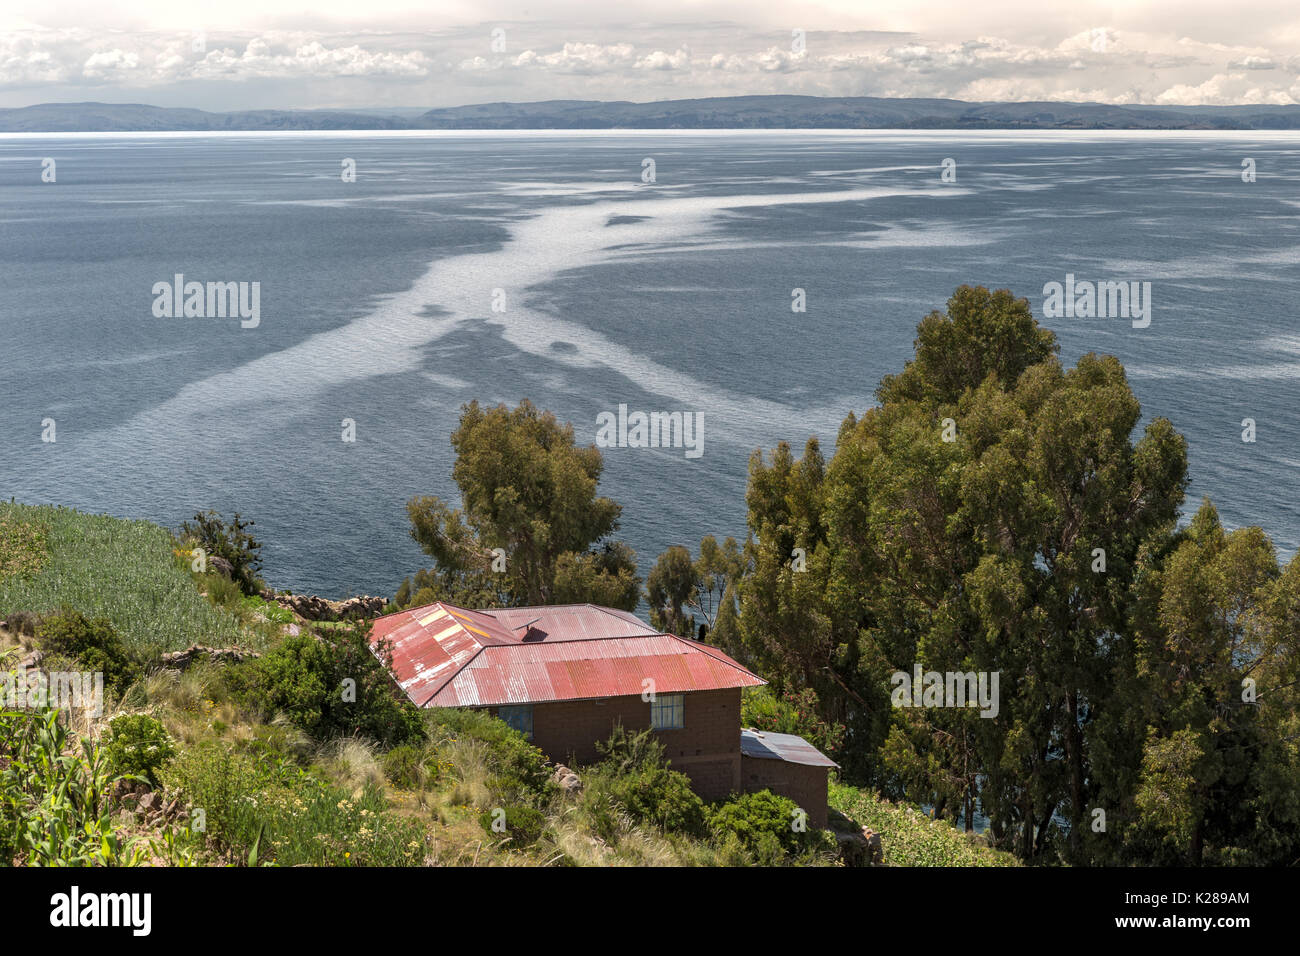 Taquile Island of the Quechua people Lake Titicaca Peru - Stock Image